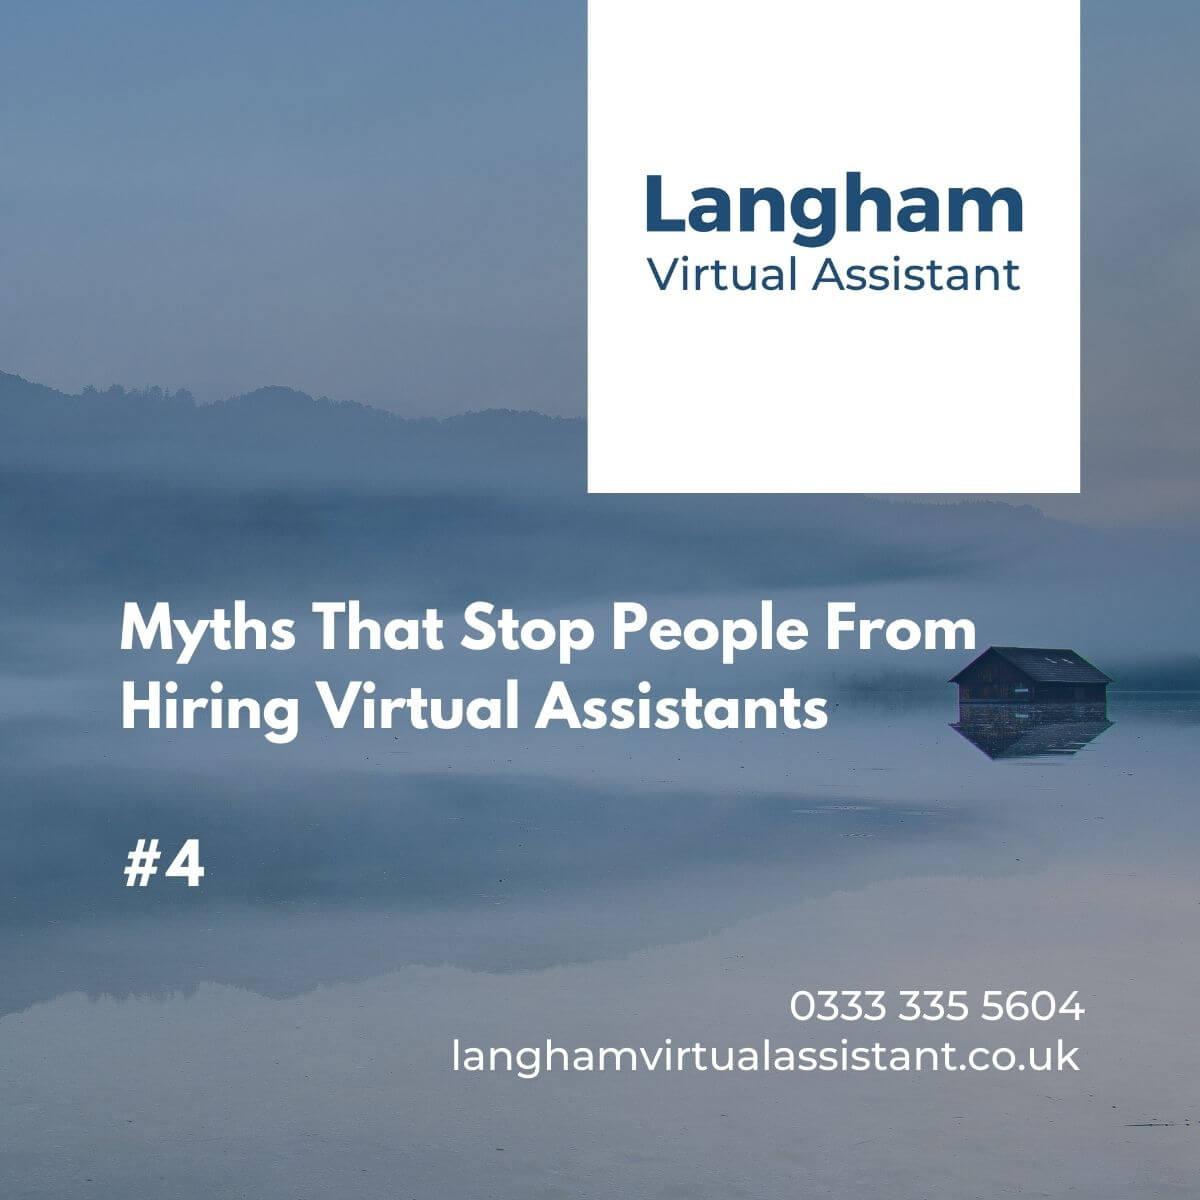 Hire a virtual assistant myth 4